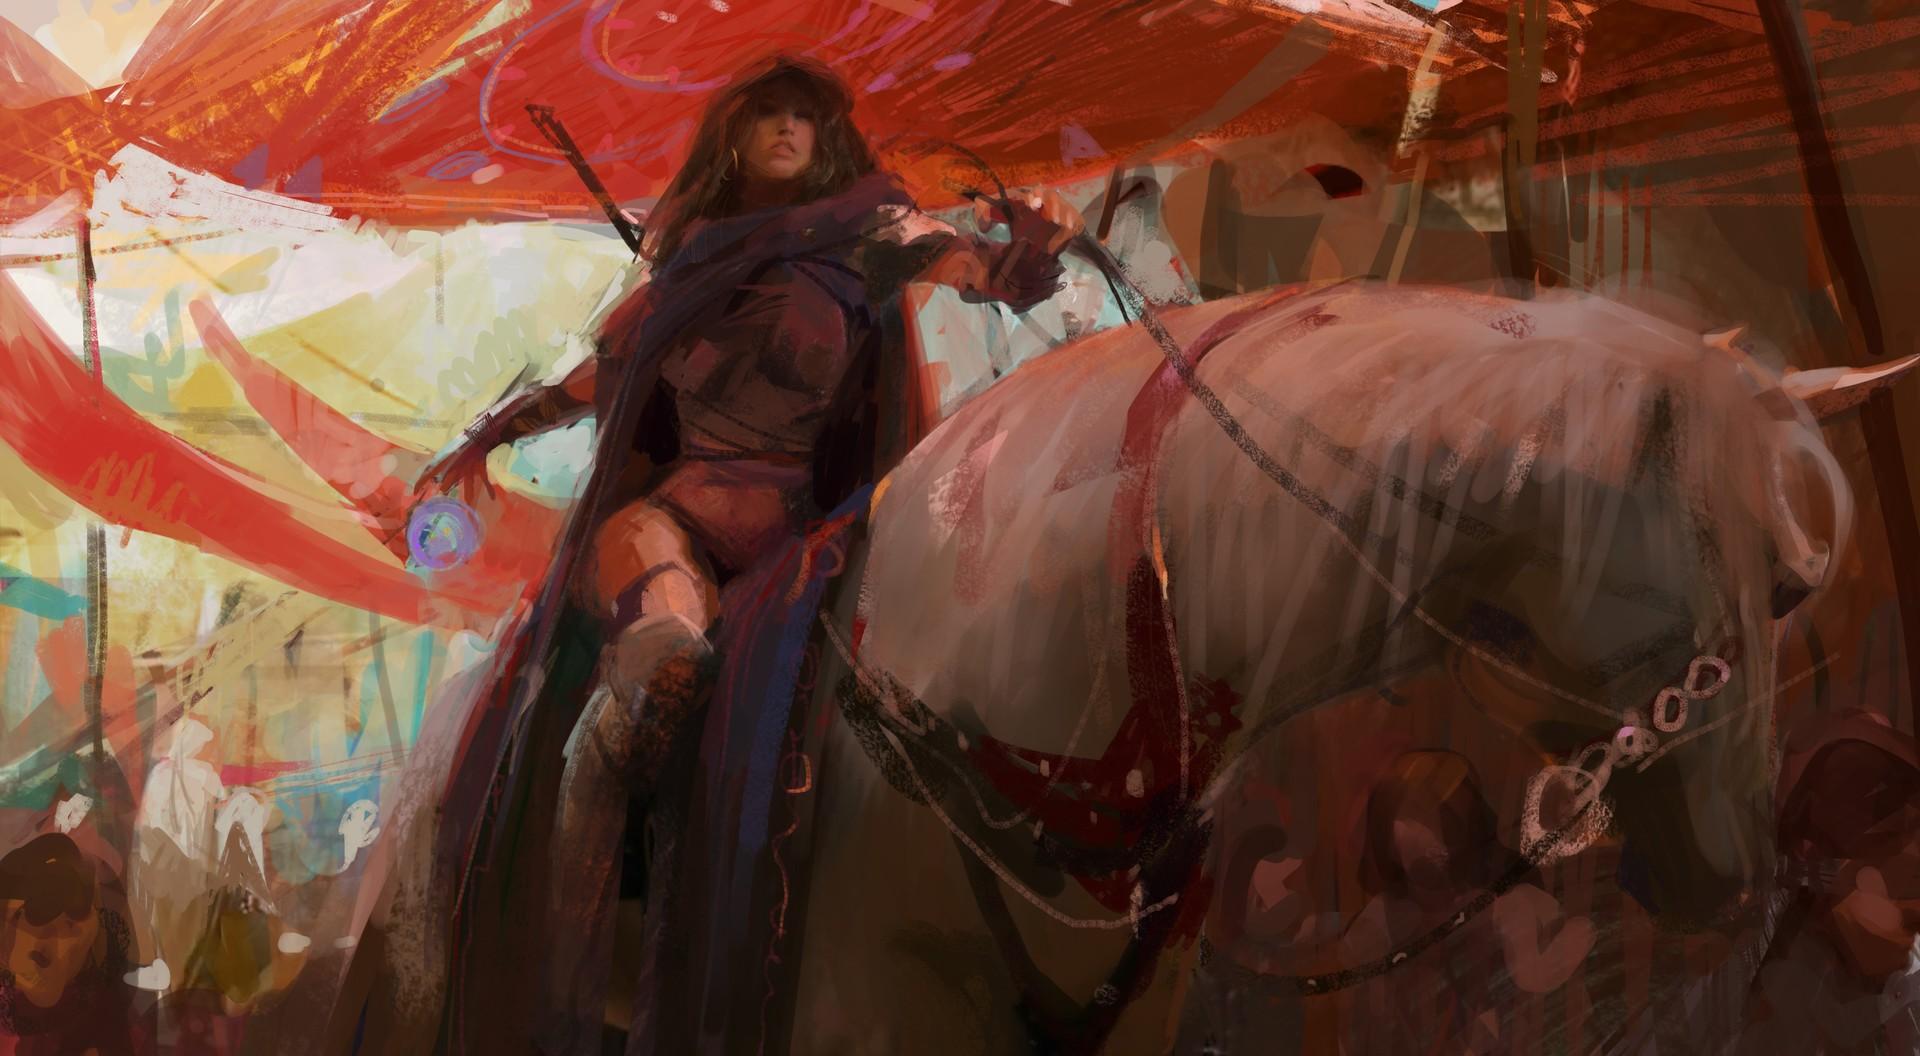 General 1920x1056 fantasy art fantasy girl horse artwork